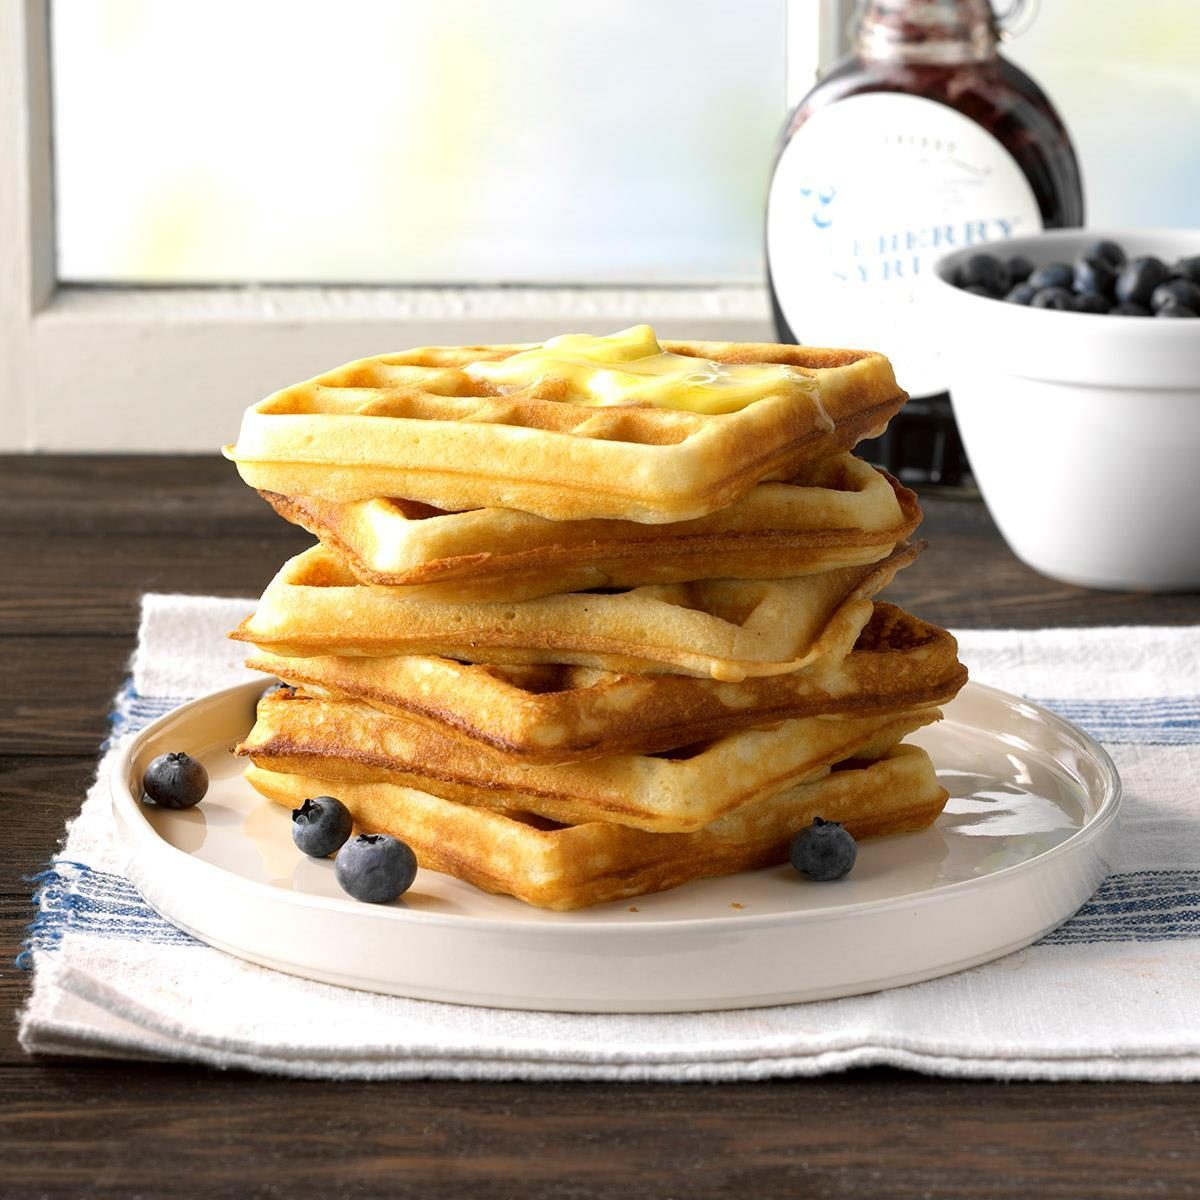 True Belgian Waffles Exps Ghbz18 4869 C08 09 2b 3